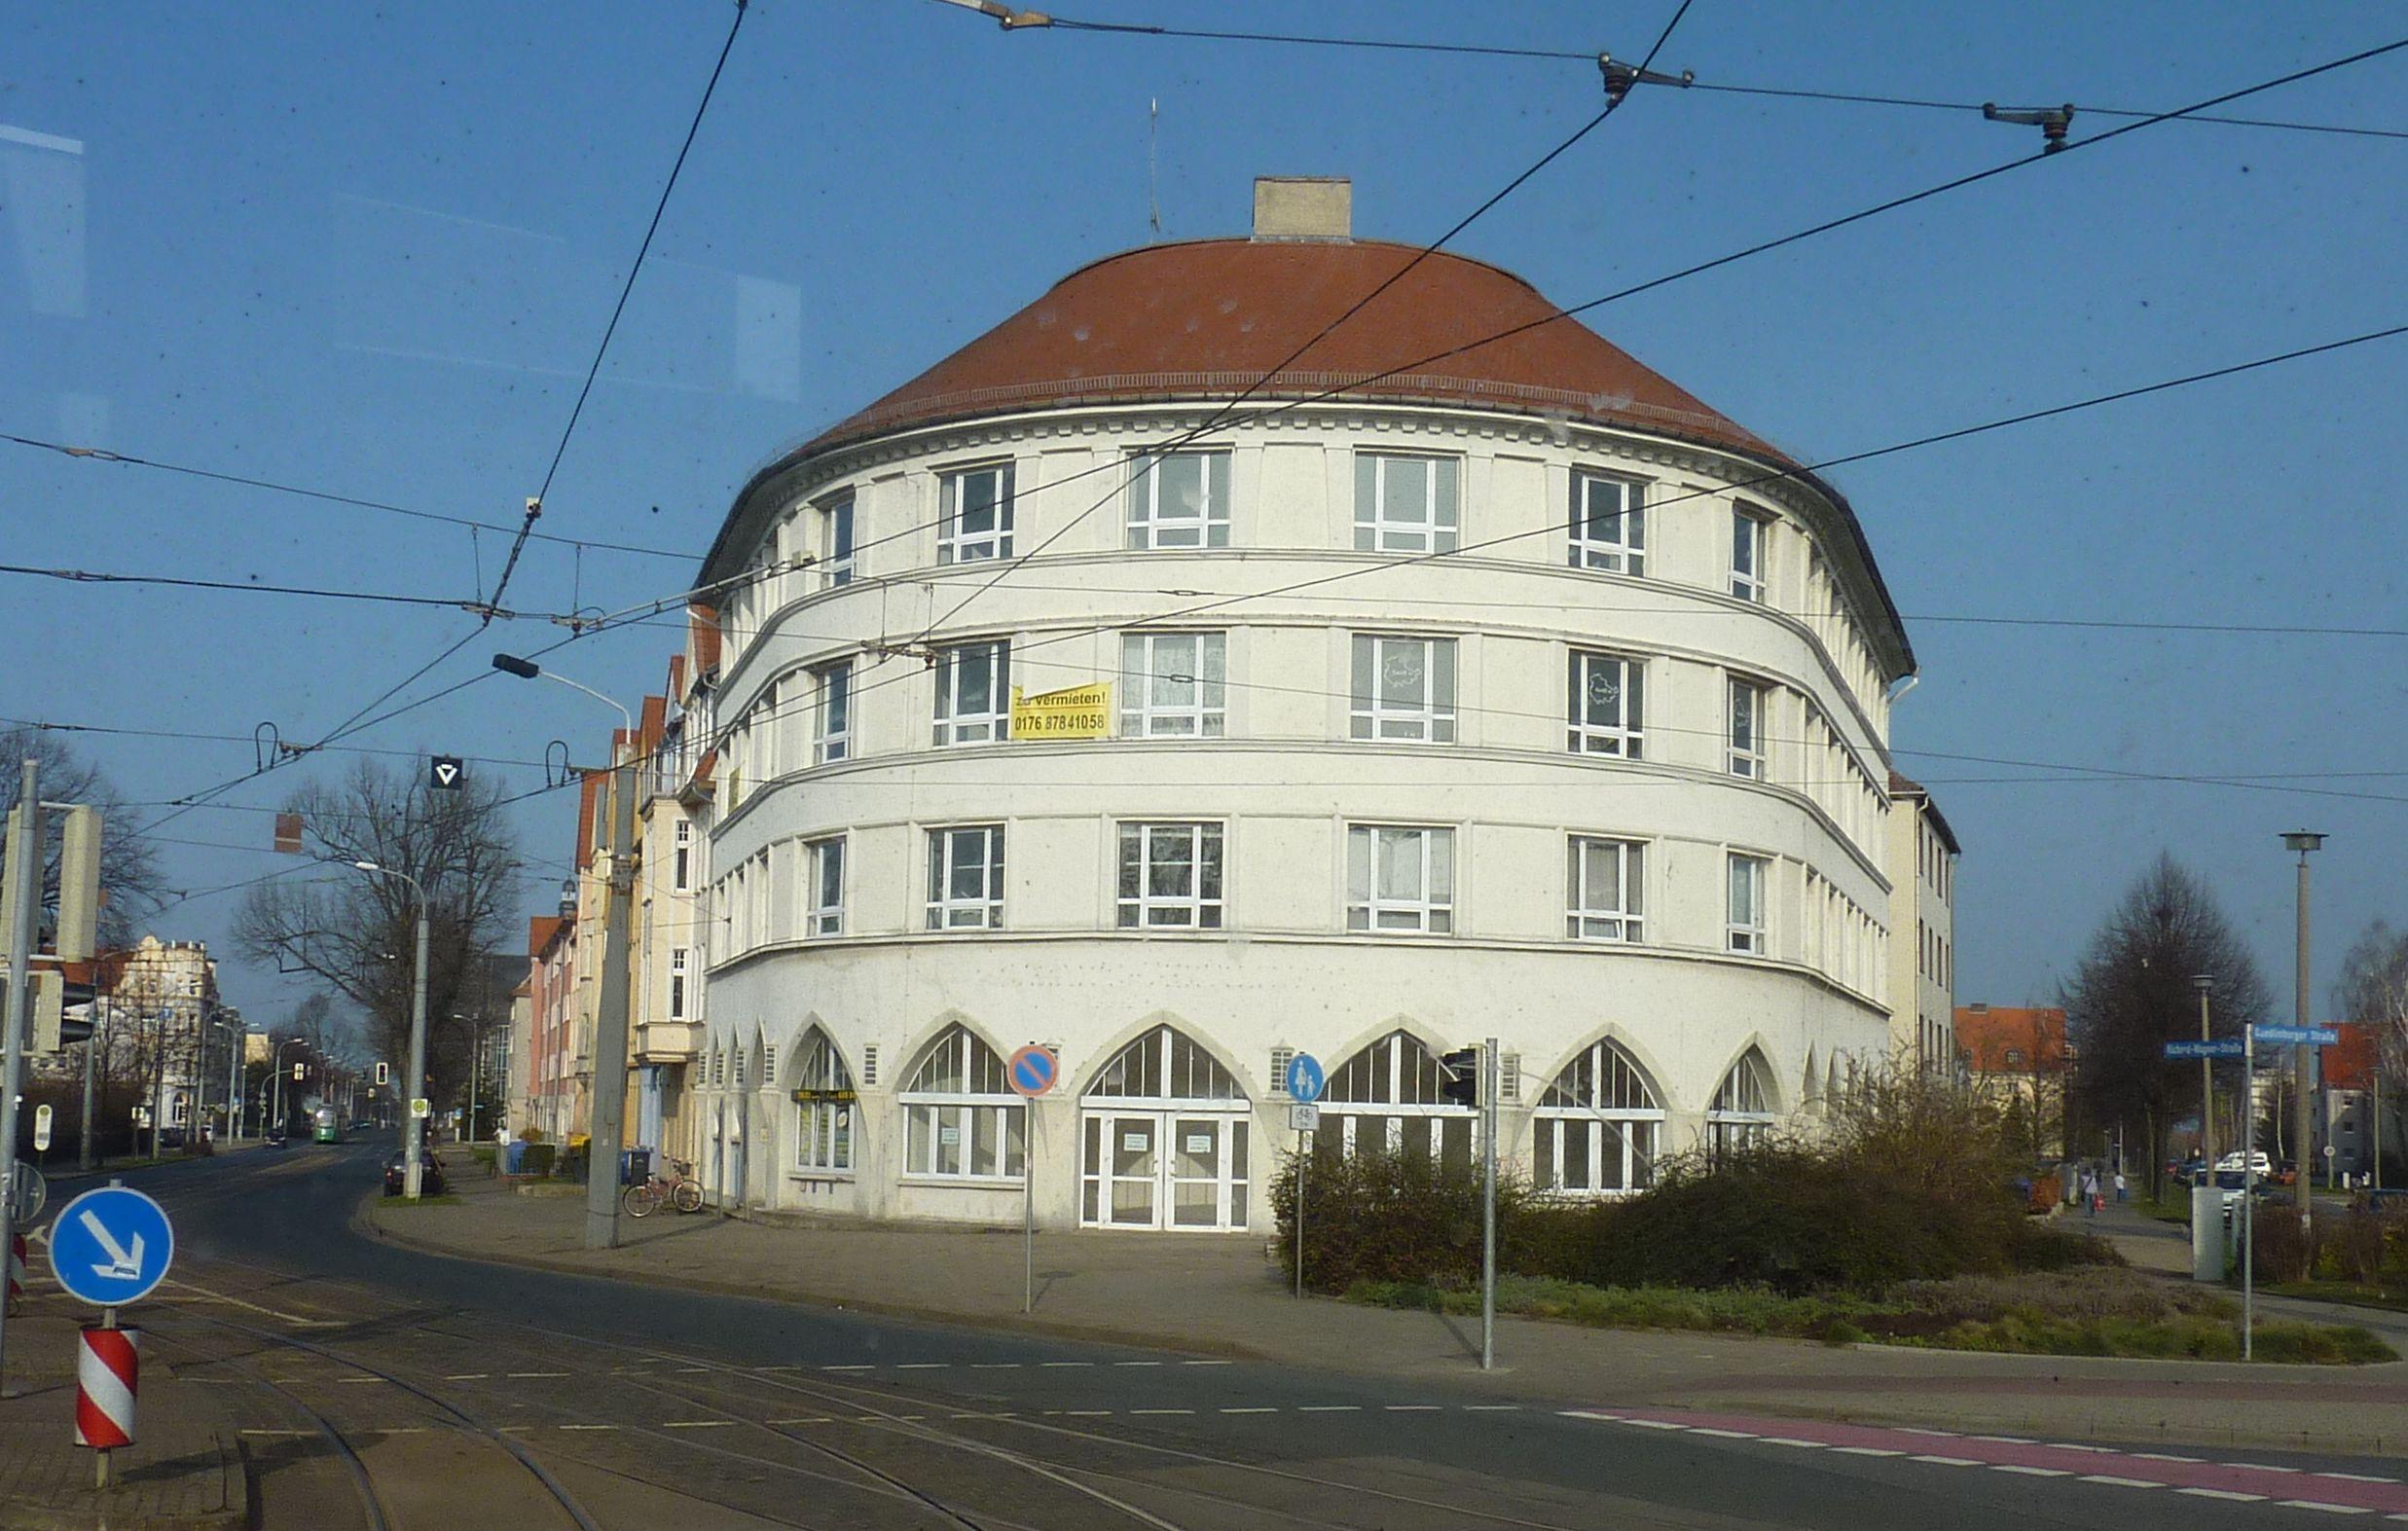 File Halberstadt Rundes Haus Jpg Wikimedia Commons